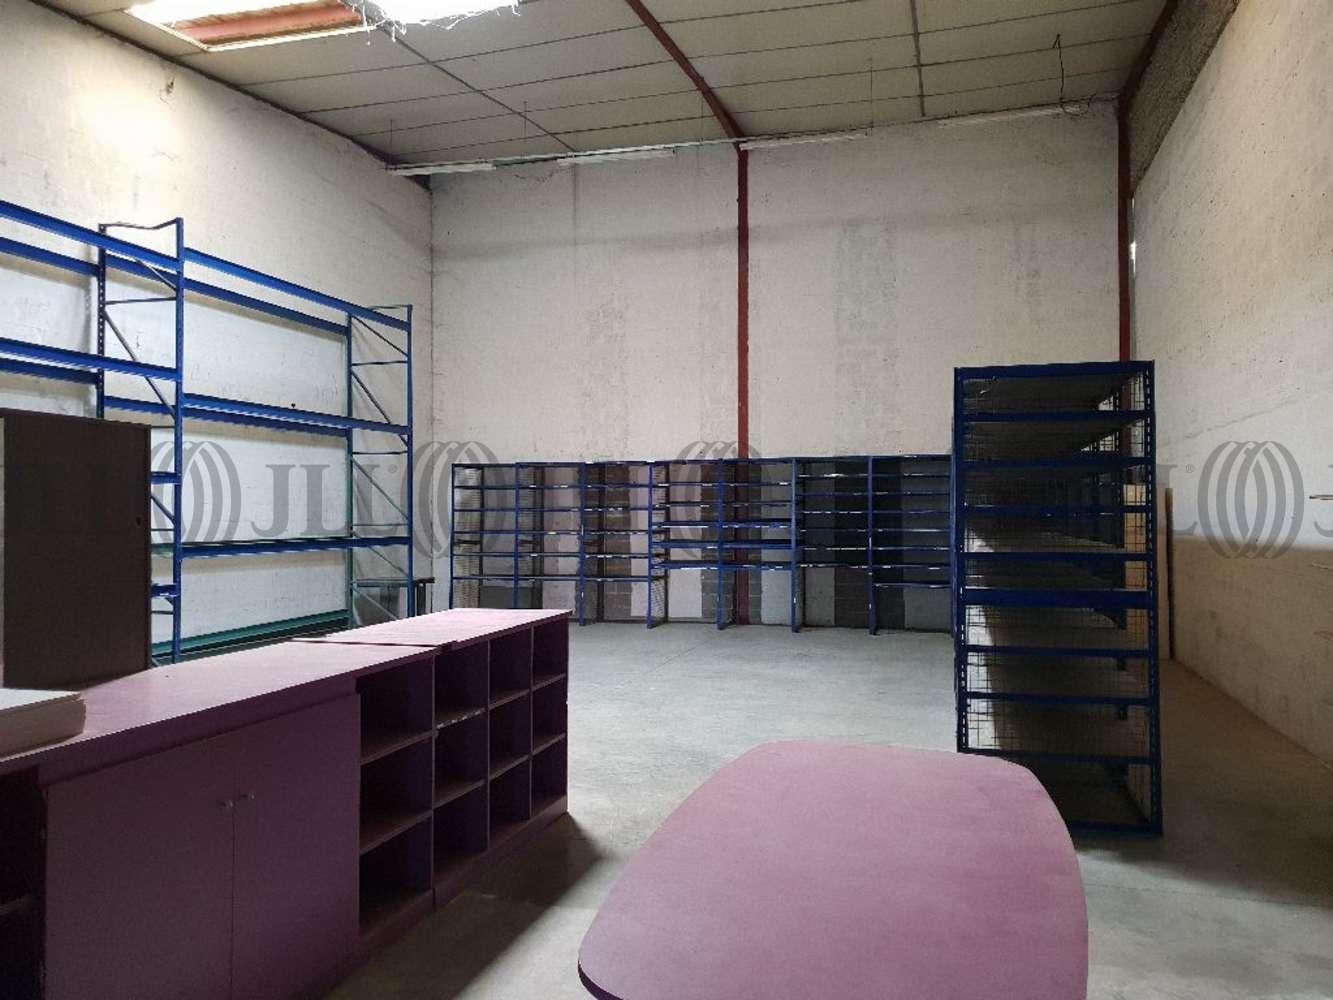 Activités/entrepôt Chassieu, 69680 - Location entrepot Chassieu (69) - 10032127